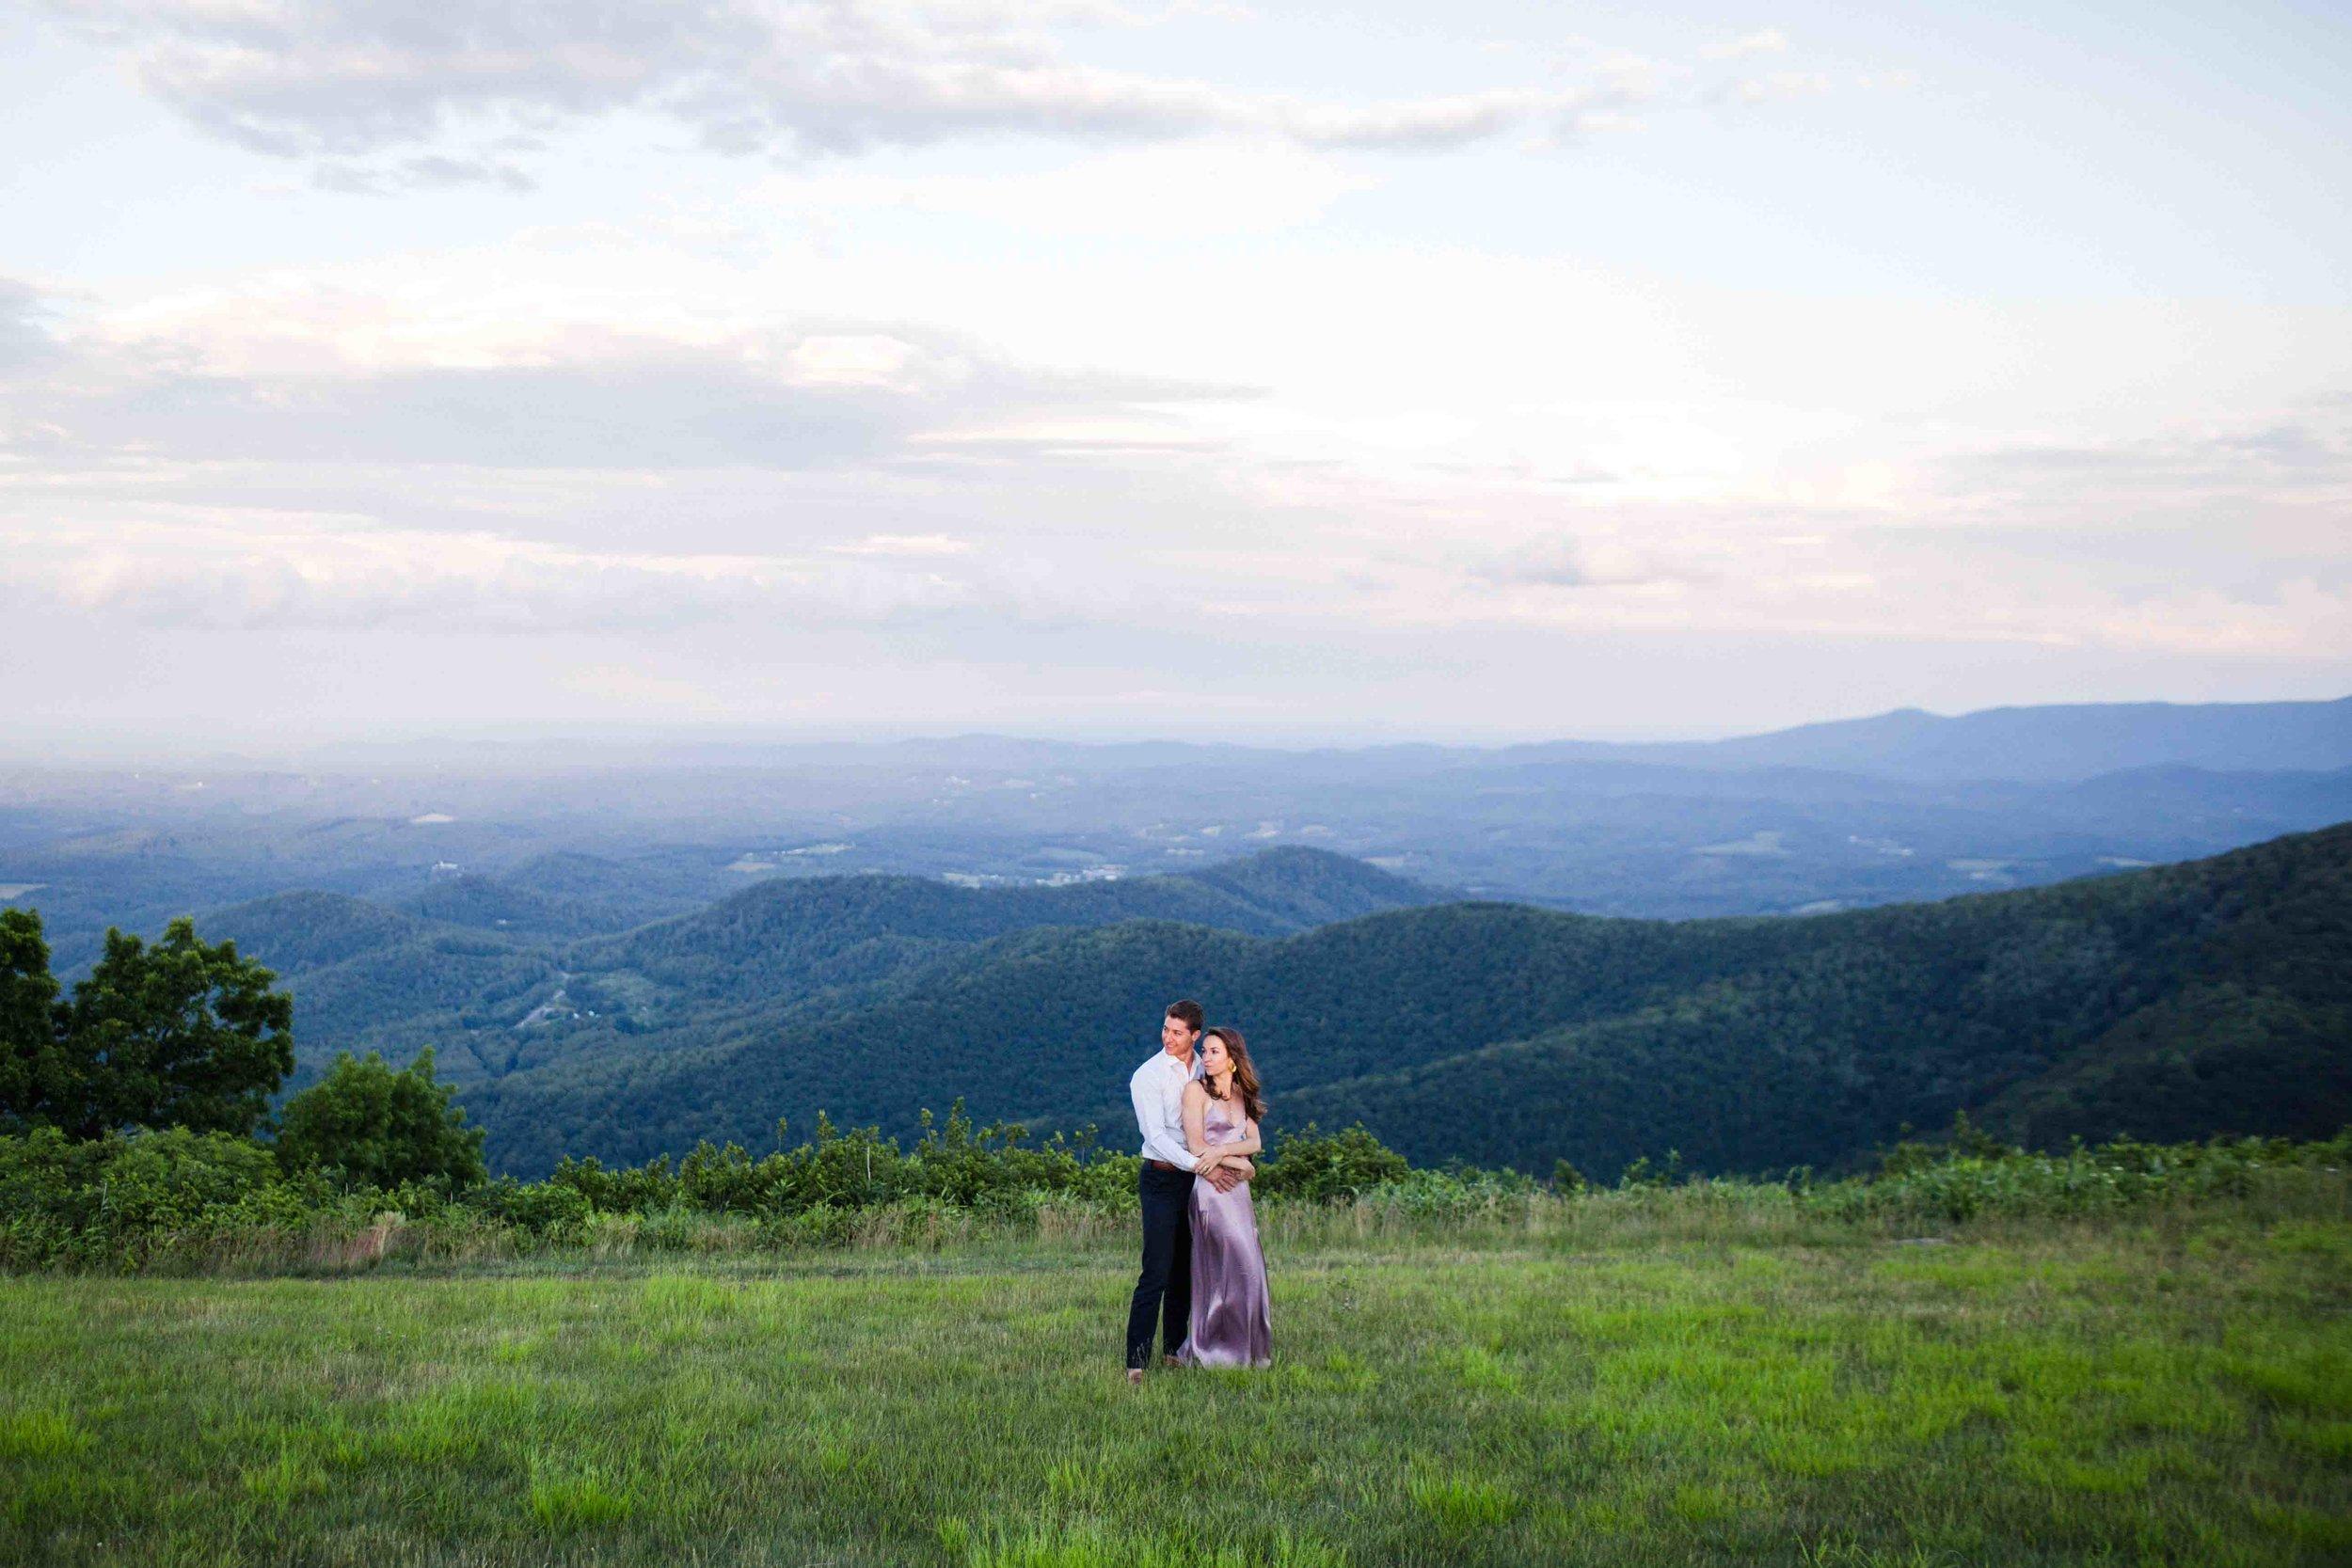 virginia-mountain-engagement-31.jpg